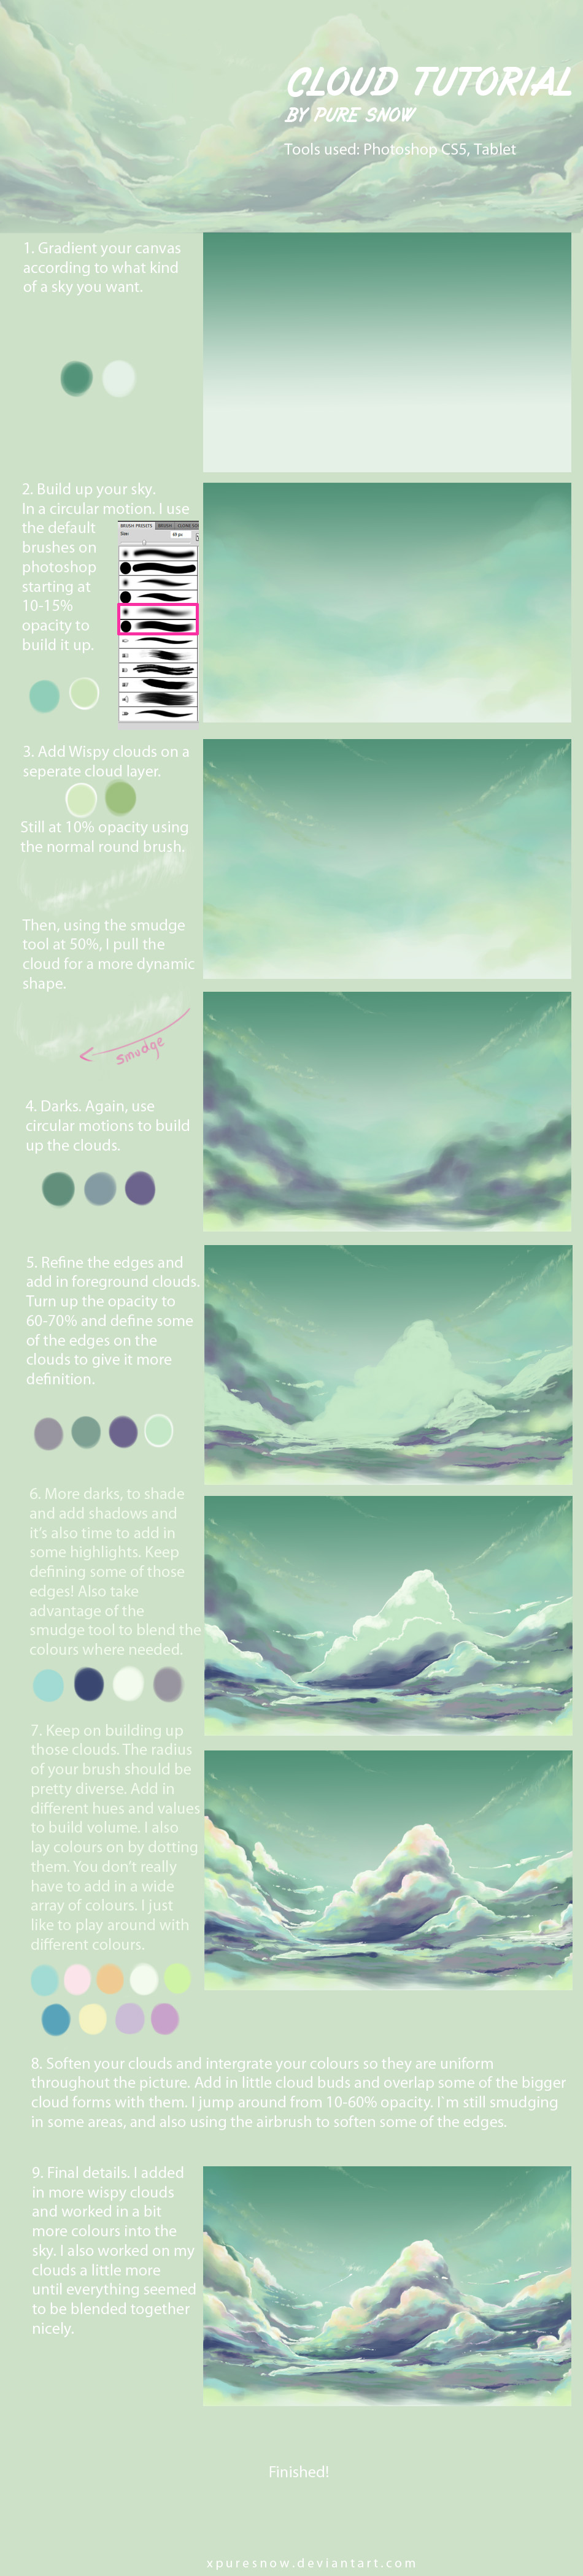 Cloud Tutorial by xpuresnow